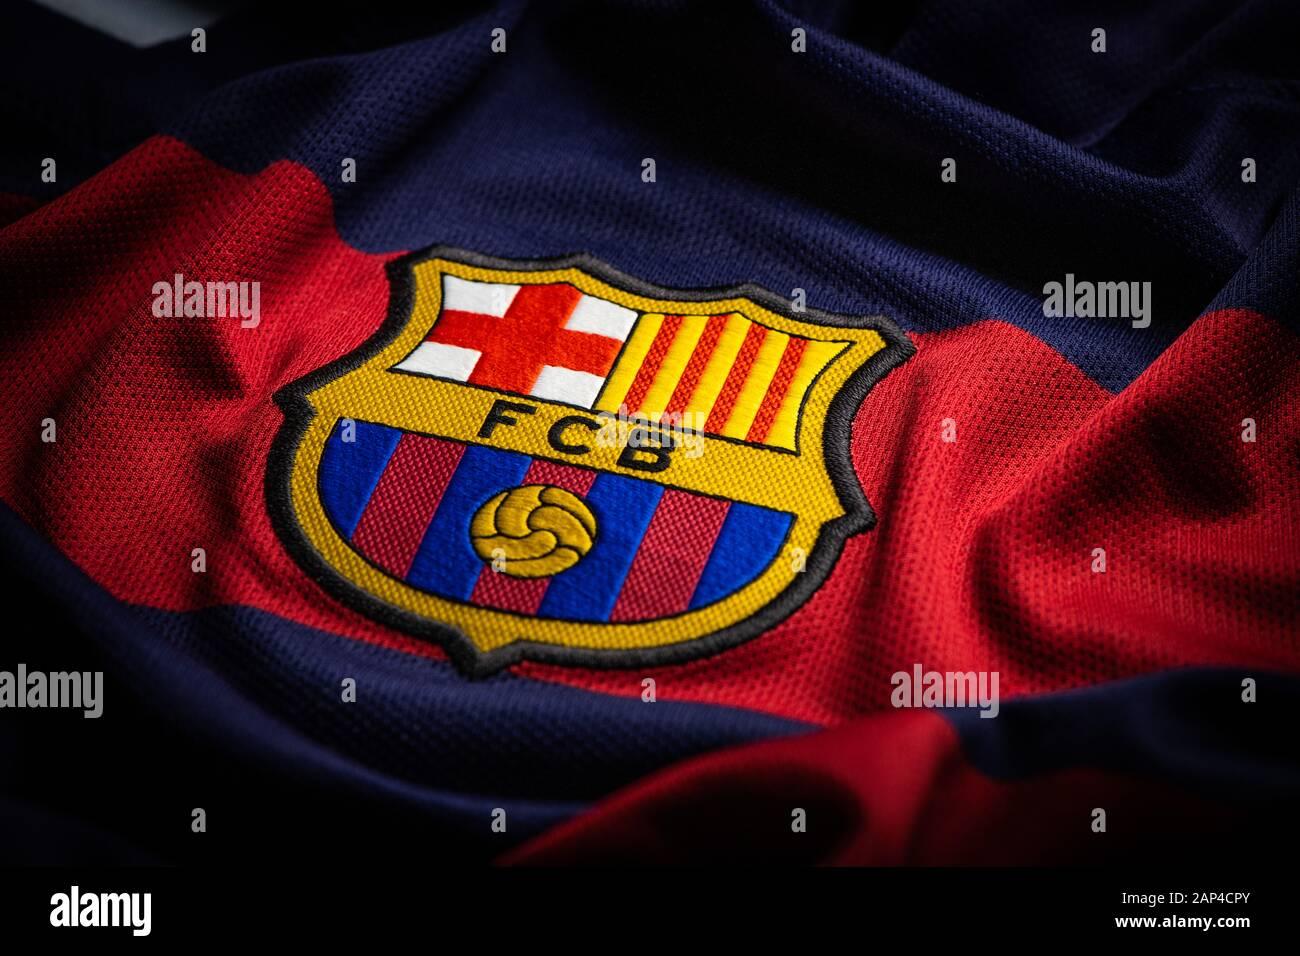 fc barcelona logo high resolution stock photography and images alamy https www alamy com france january 21 2020 fc barcelona spanish football club logo on jersey image340617283 html